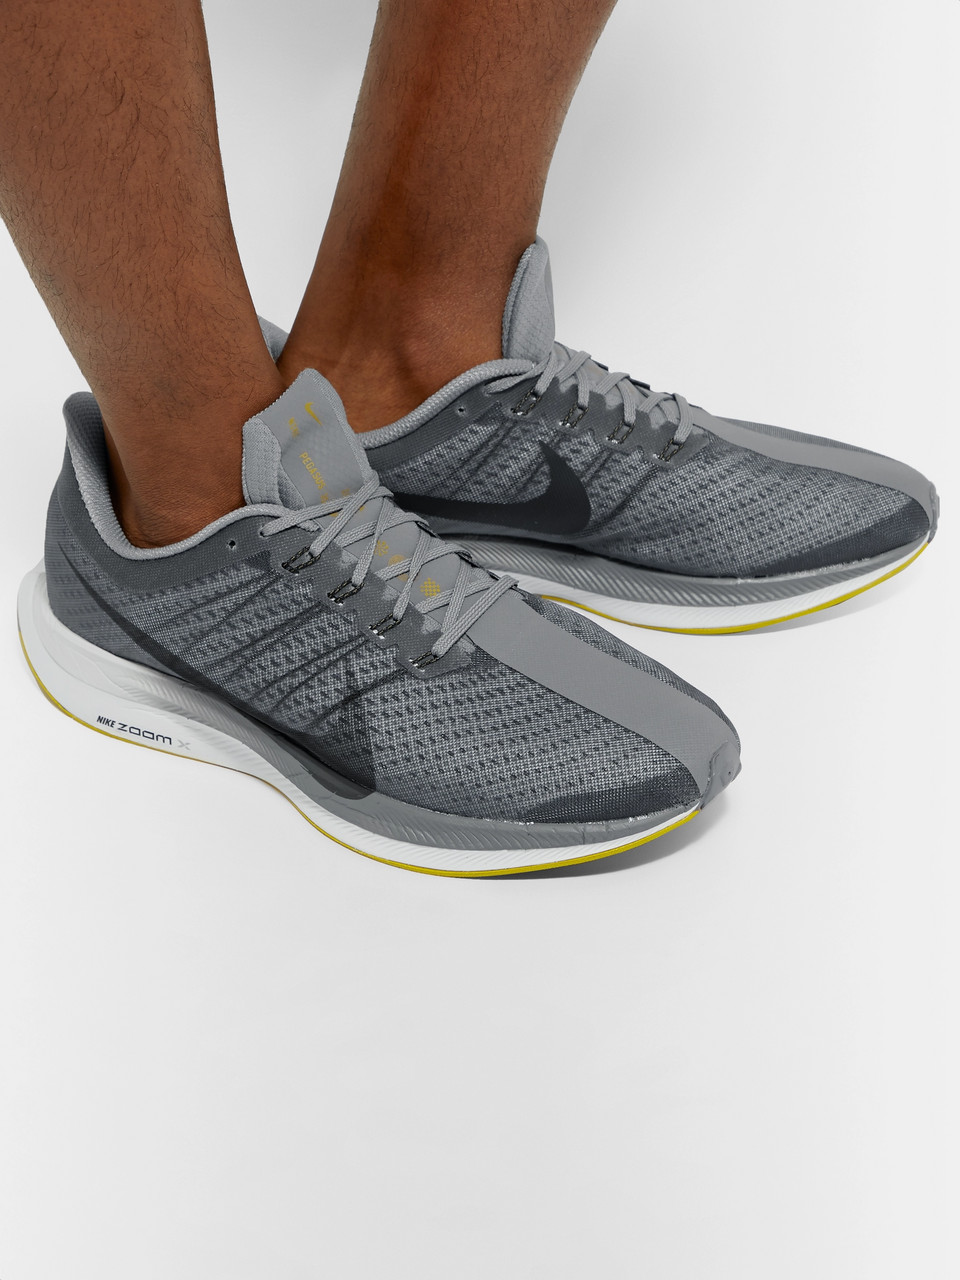 6abd46ab707 Nike Running Nike Air Zoom Pegasus 35 Turbo Mesh Sneakers